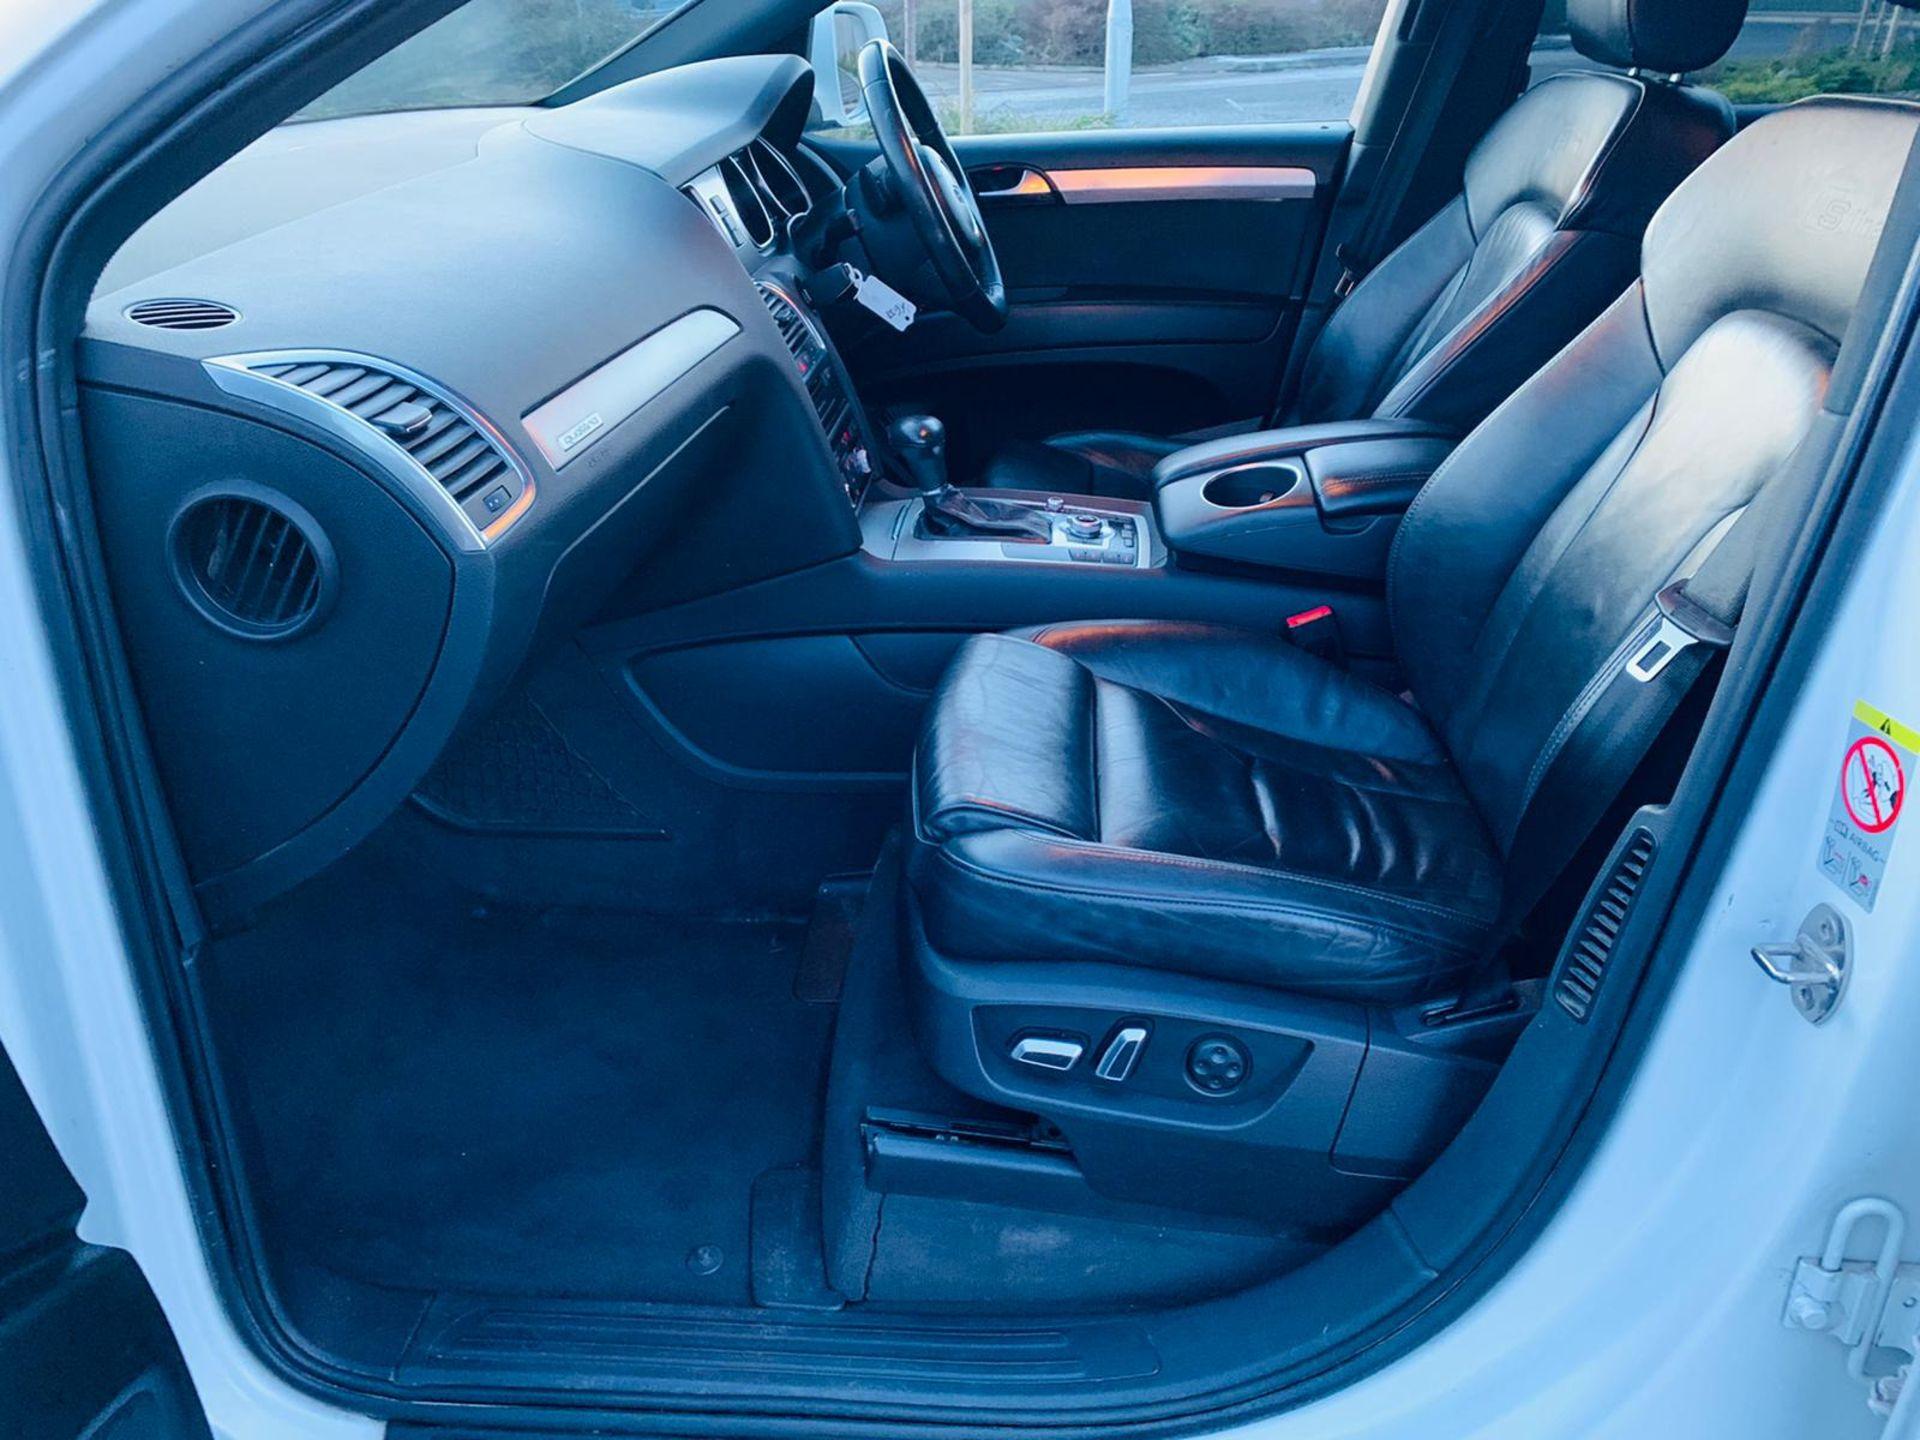 (Reserve Met)Audi Q7 3.0 TDI Quattro S Line Plus Auto (7 Seats) - 12 Reg - Only 63k Miles -Sat Nav- - Image 18 of 37